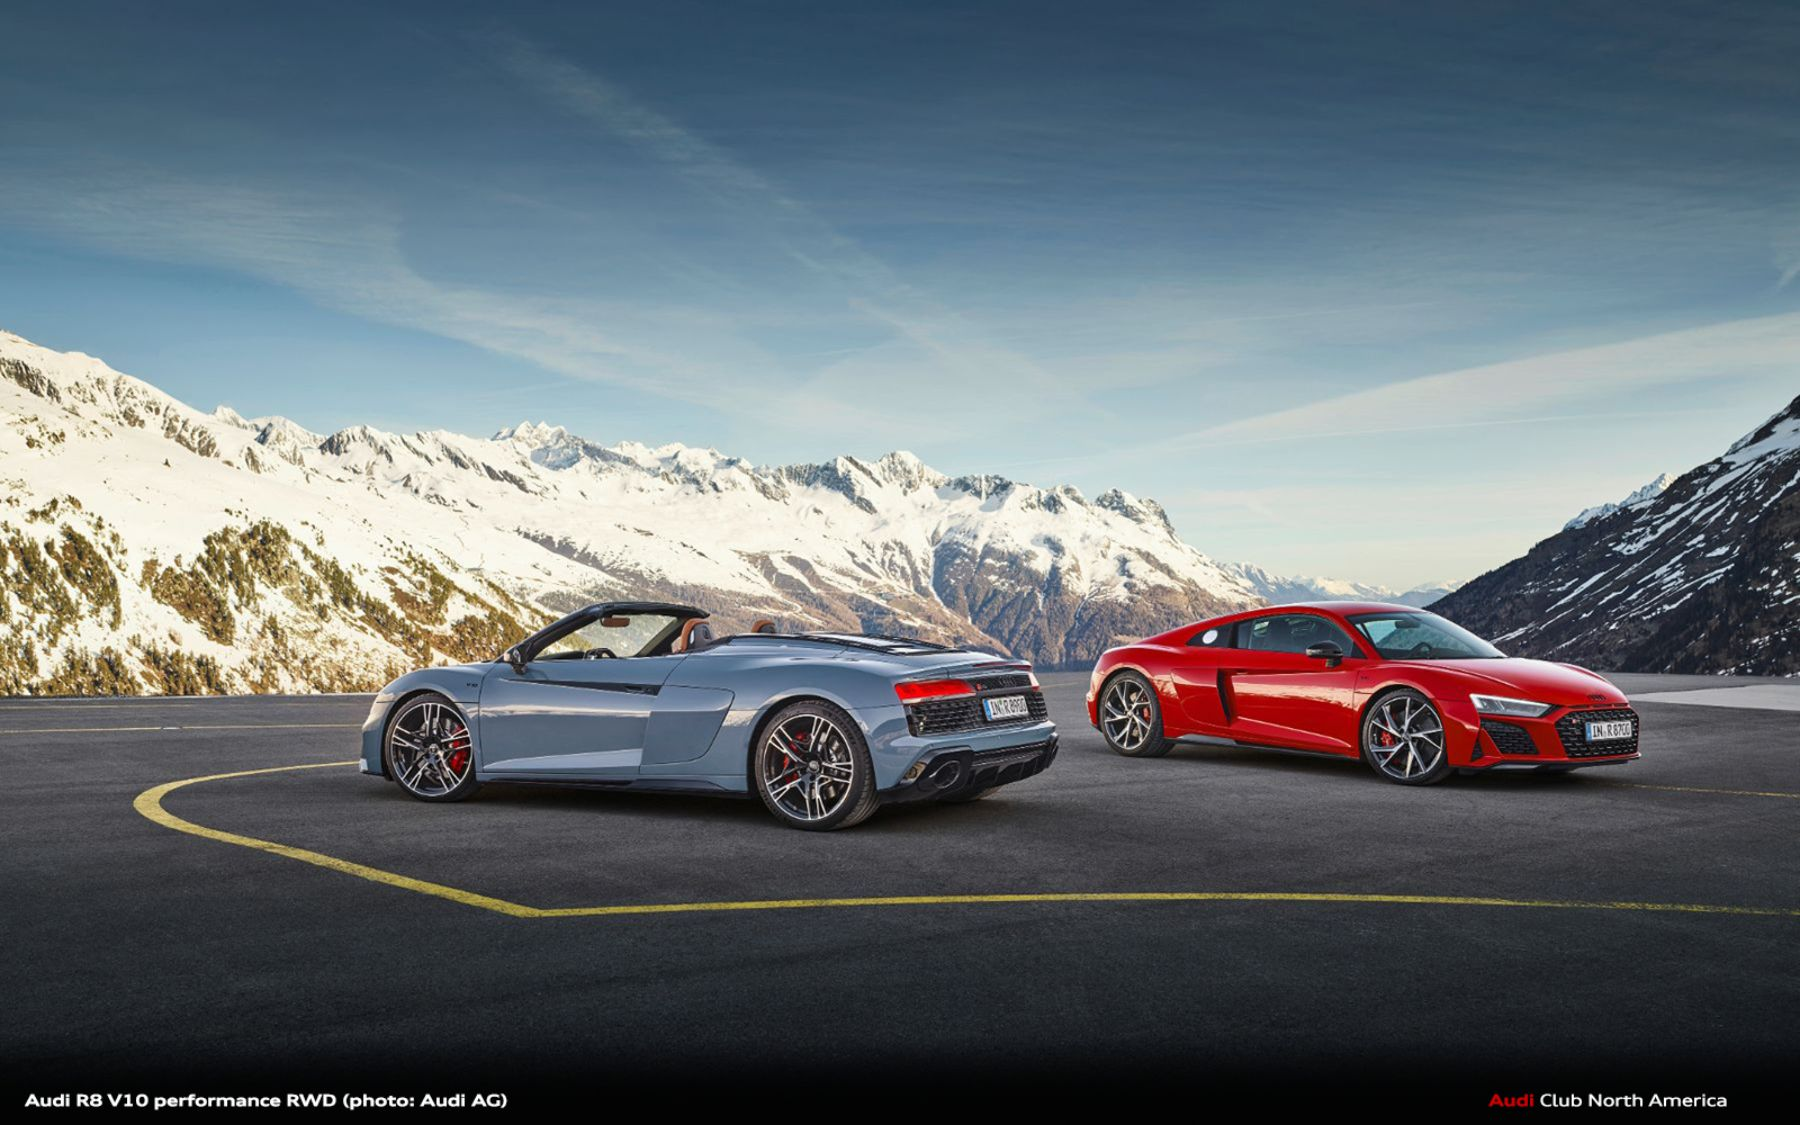 The Sheer Joy of Driving Meets Enhanced Performance: the Audi R8 V10 performance RWD